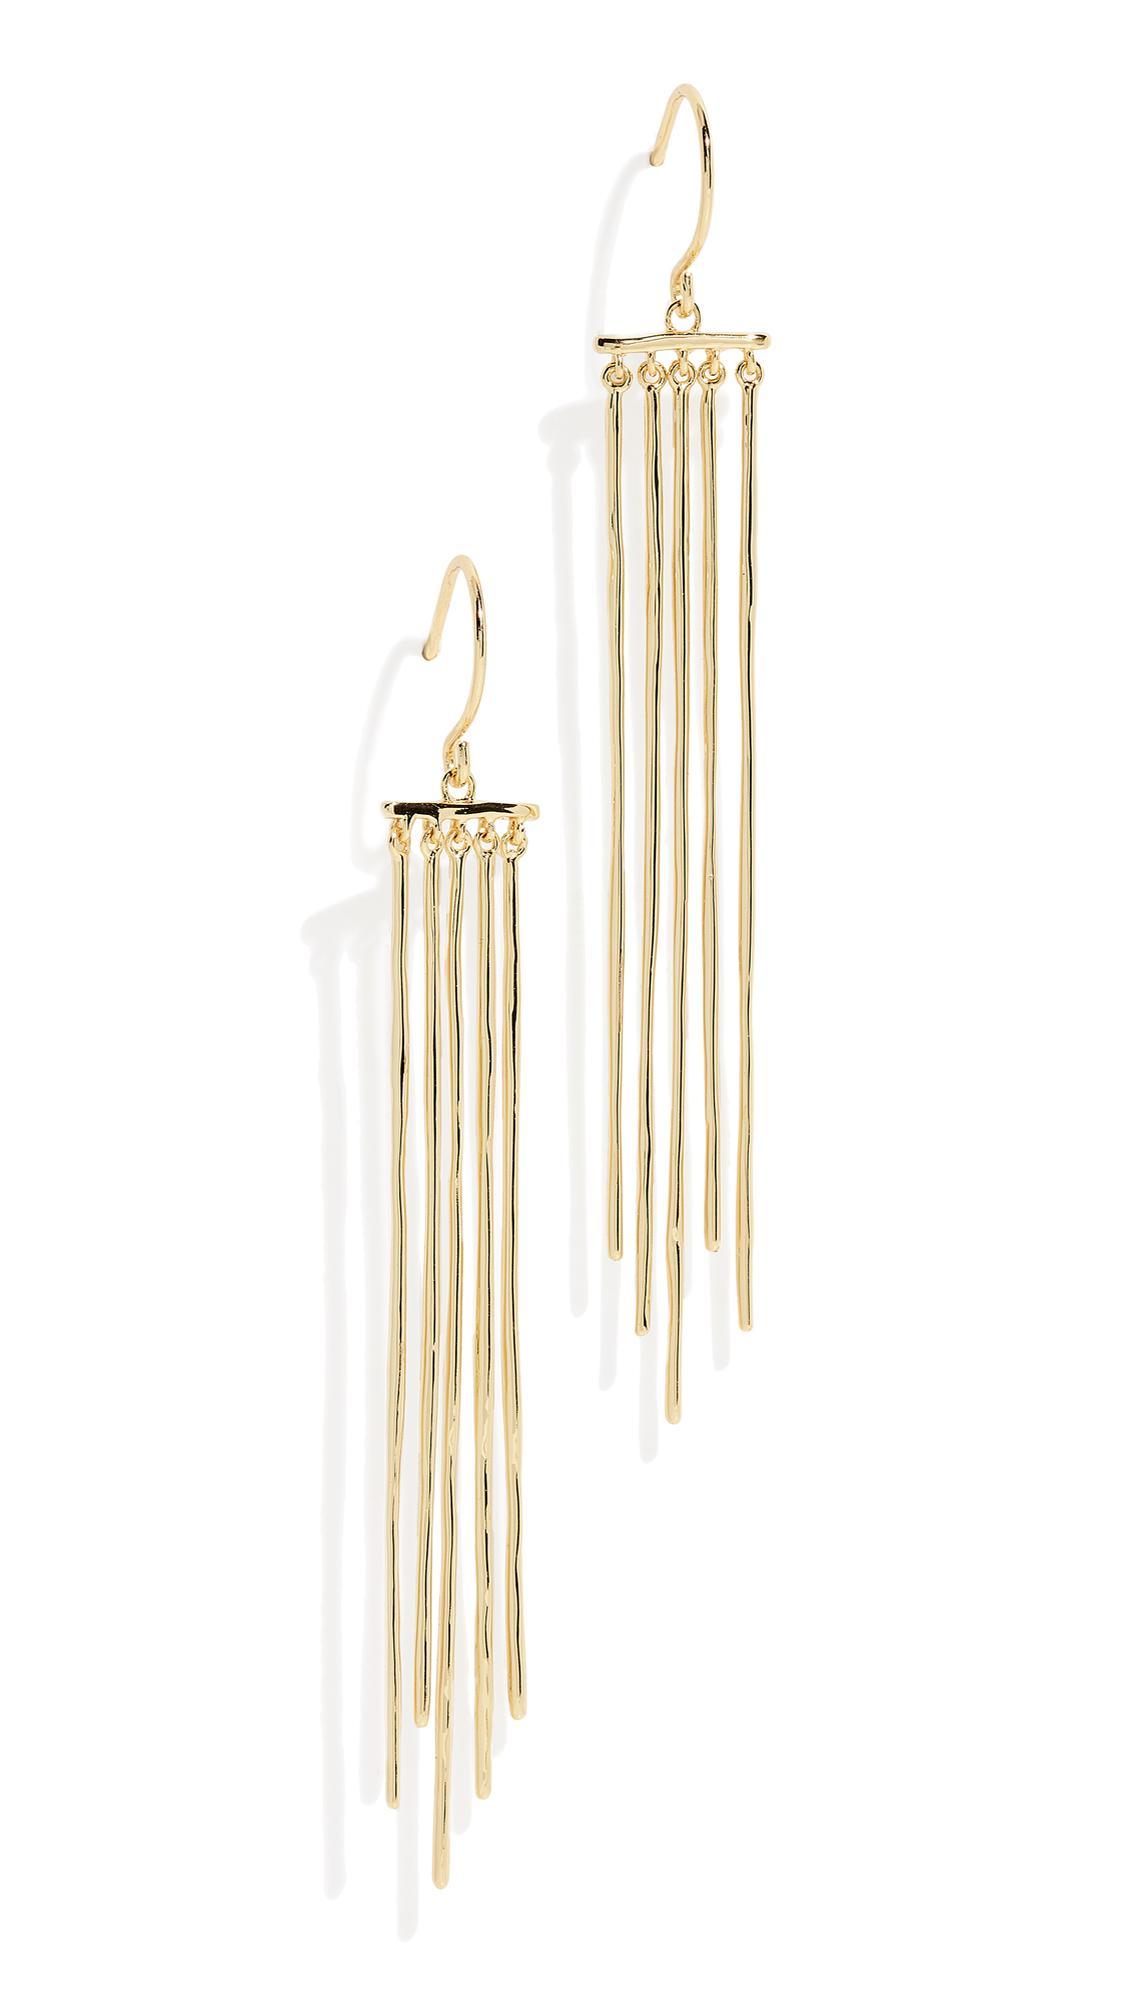 Gorjana Josey Earrings In Yellow Gold